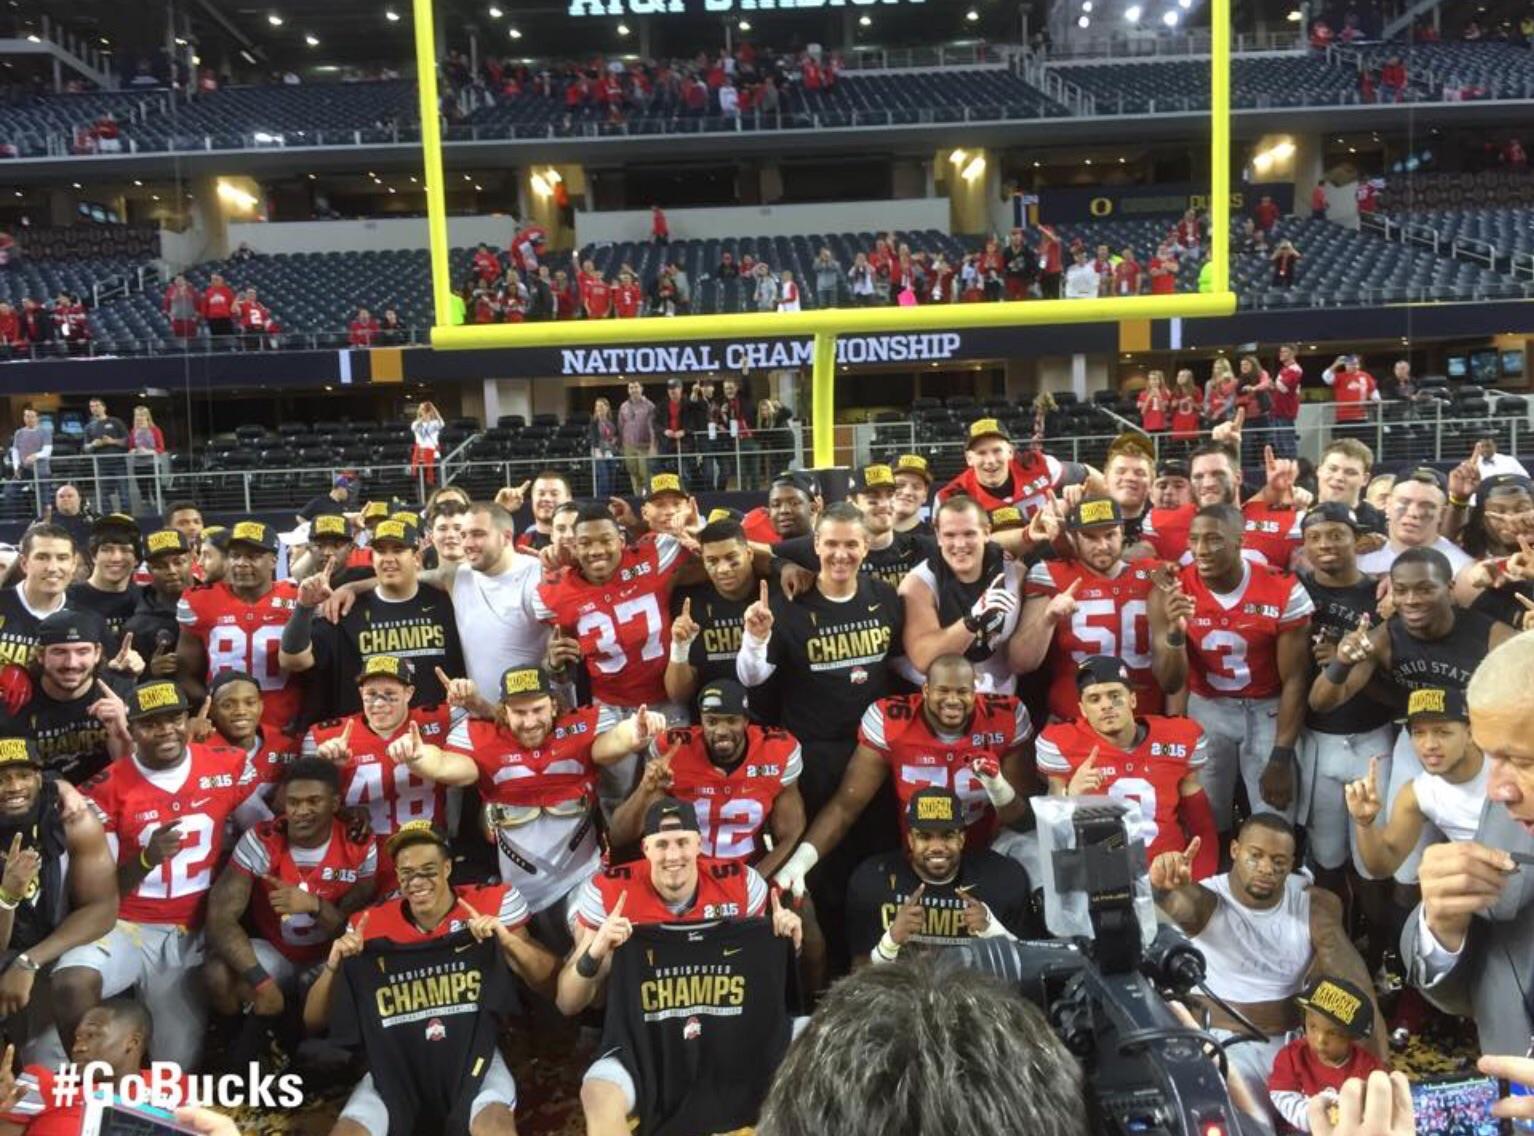 Your 2014 champions: Ohio State University Buckeyes (Facebook photo)